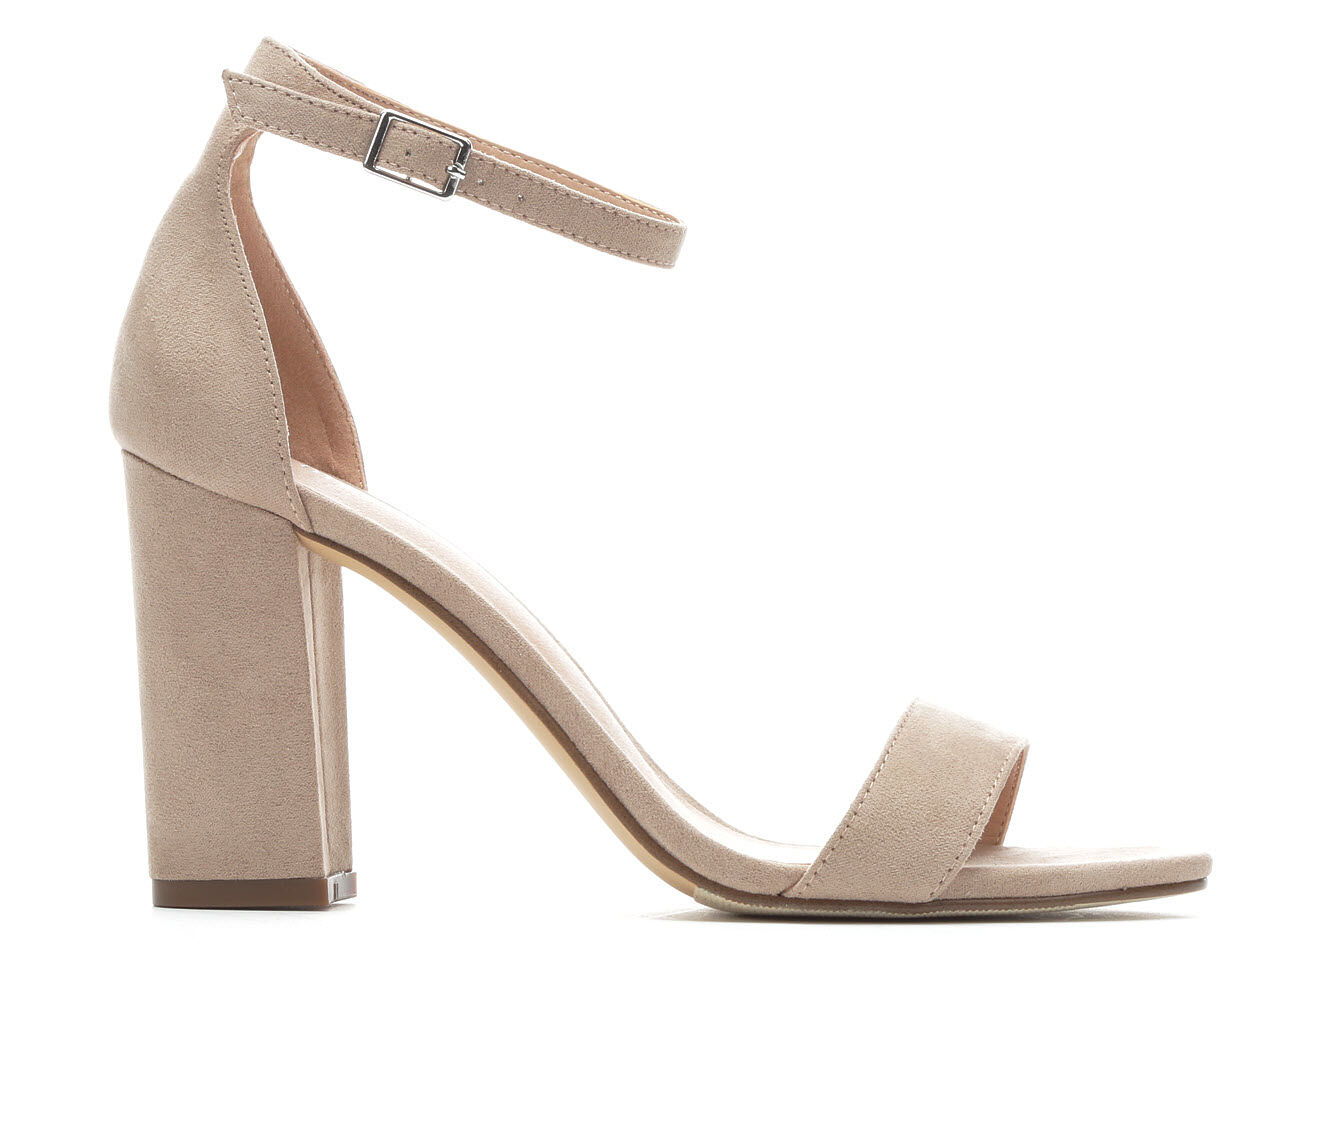 uk shoes_kd6420